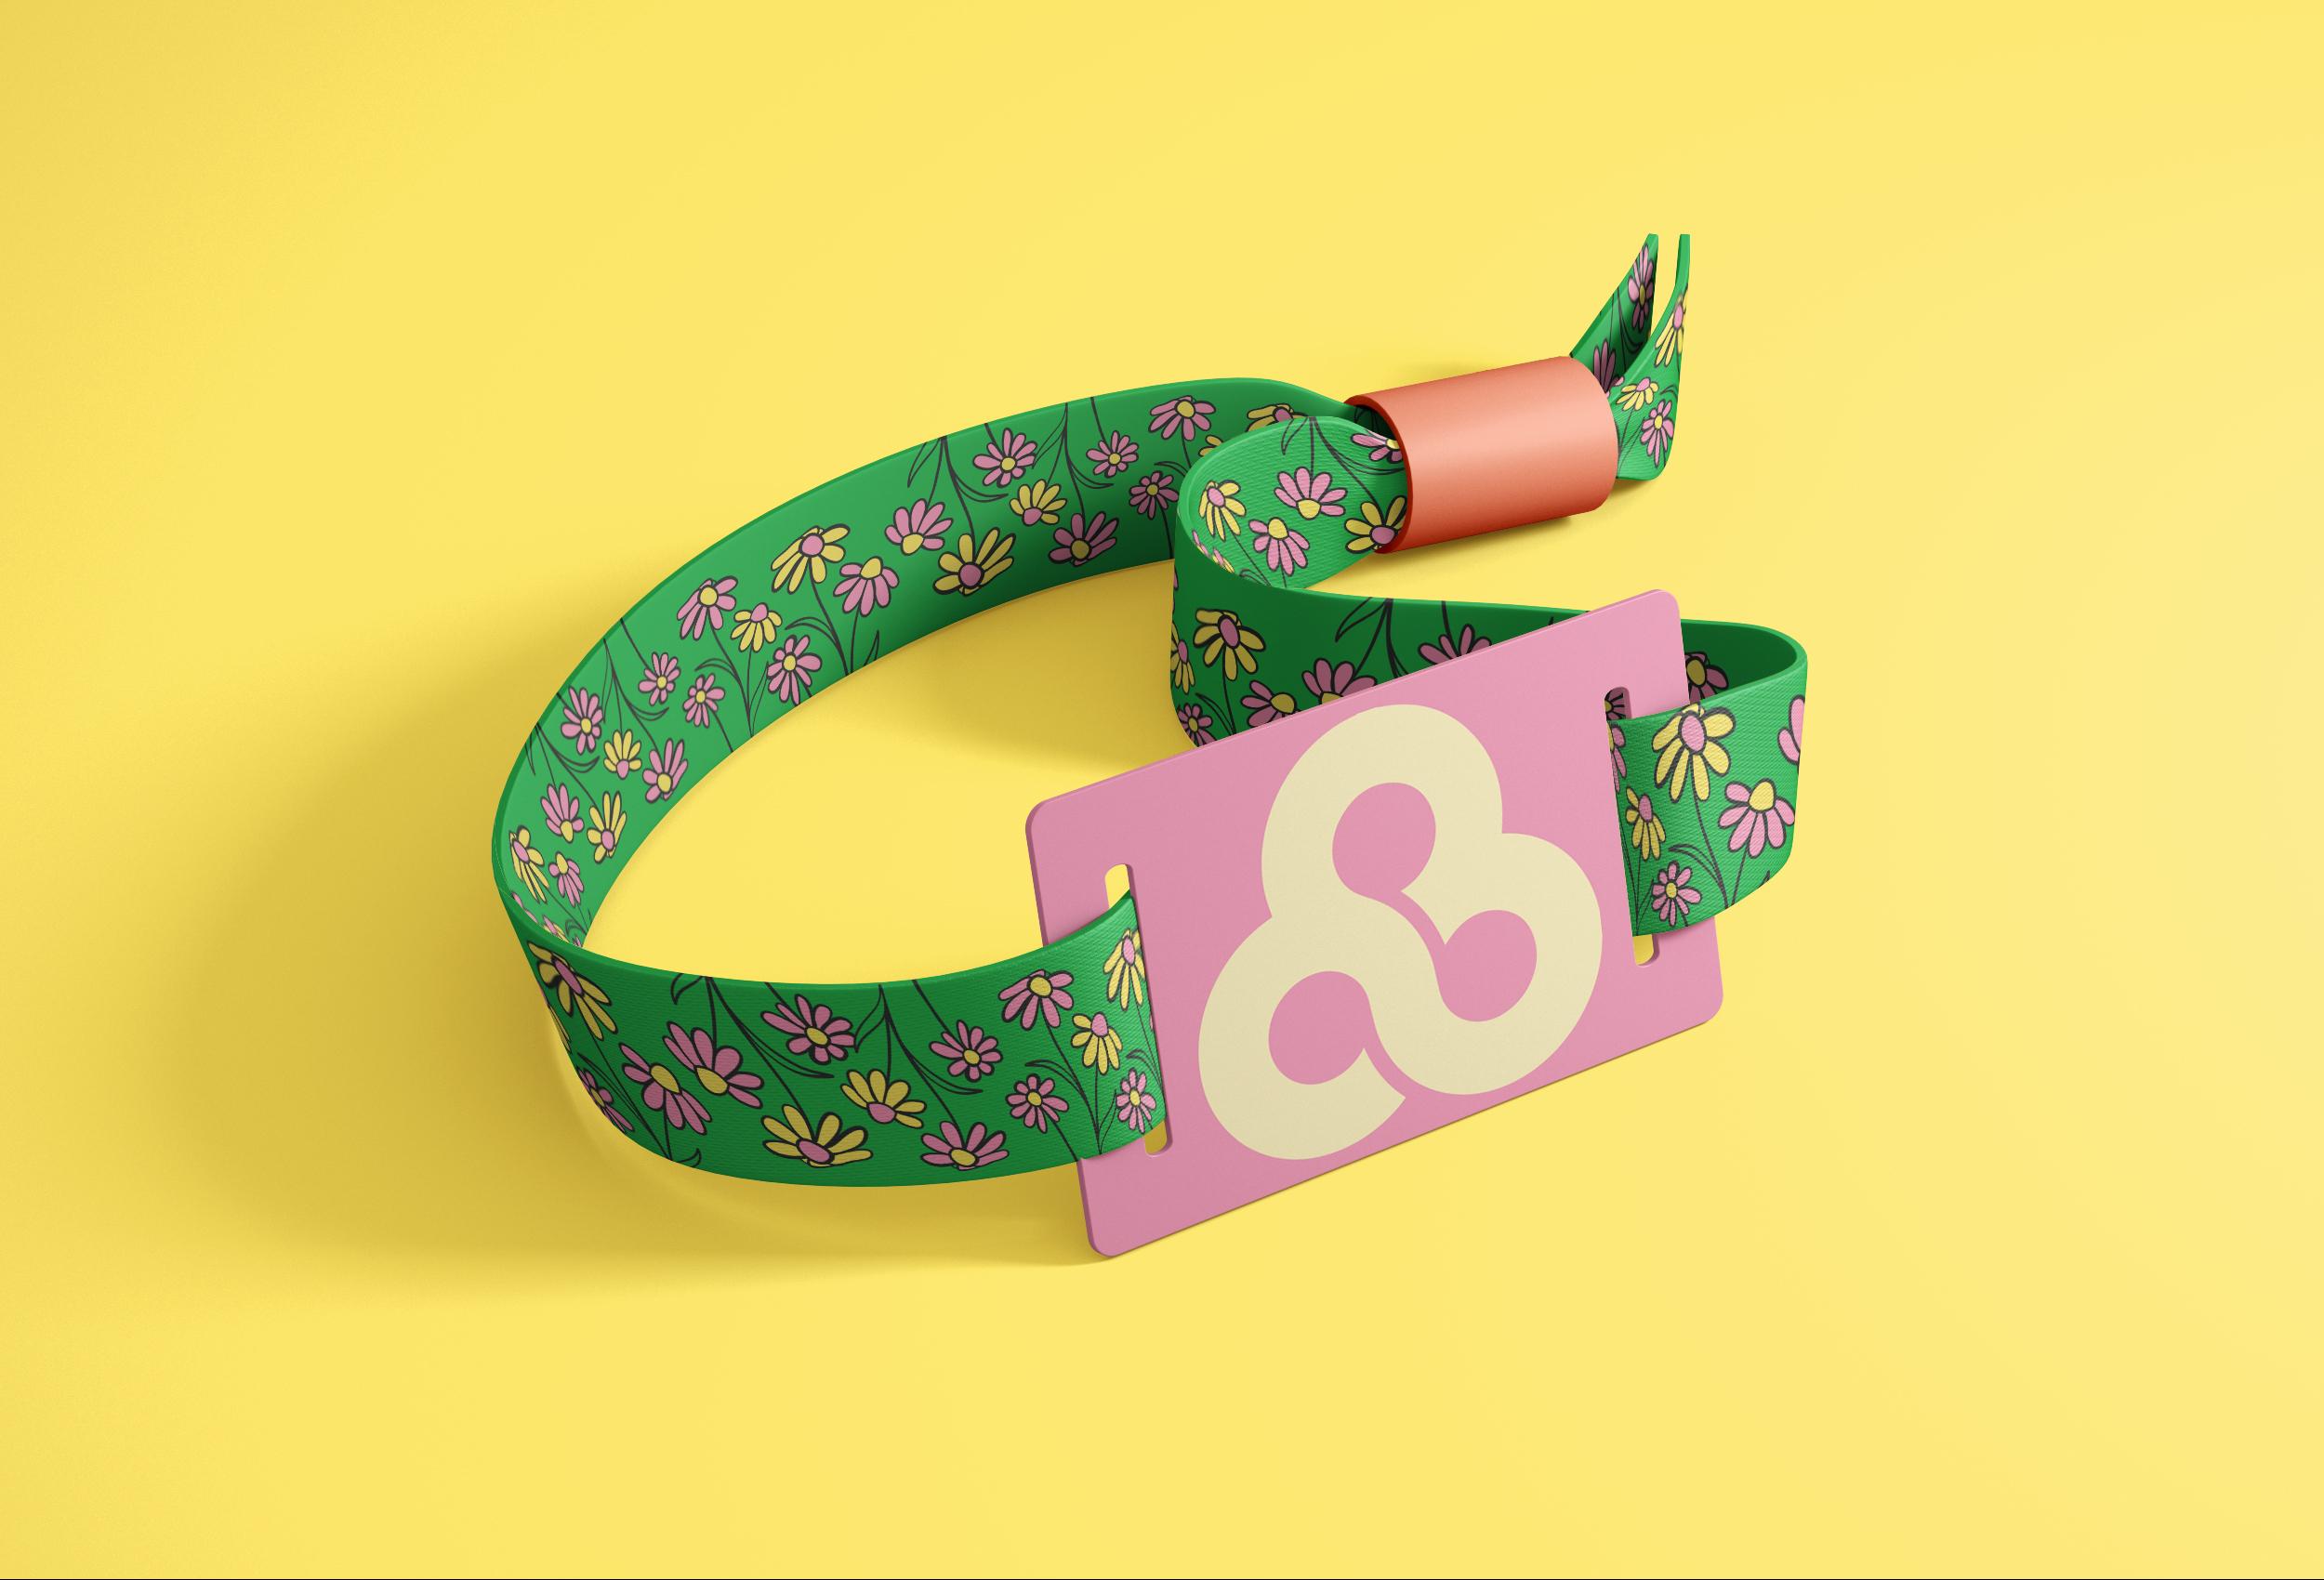 bonaroo_wristband.jpg